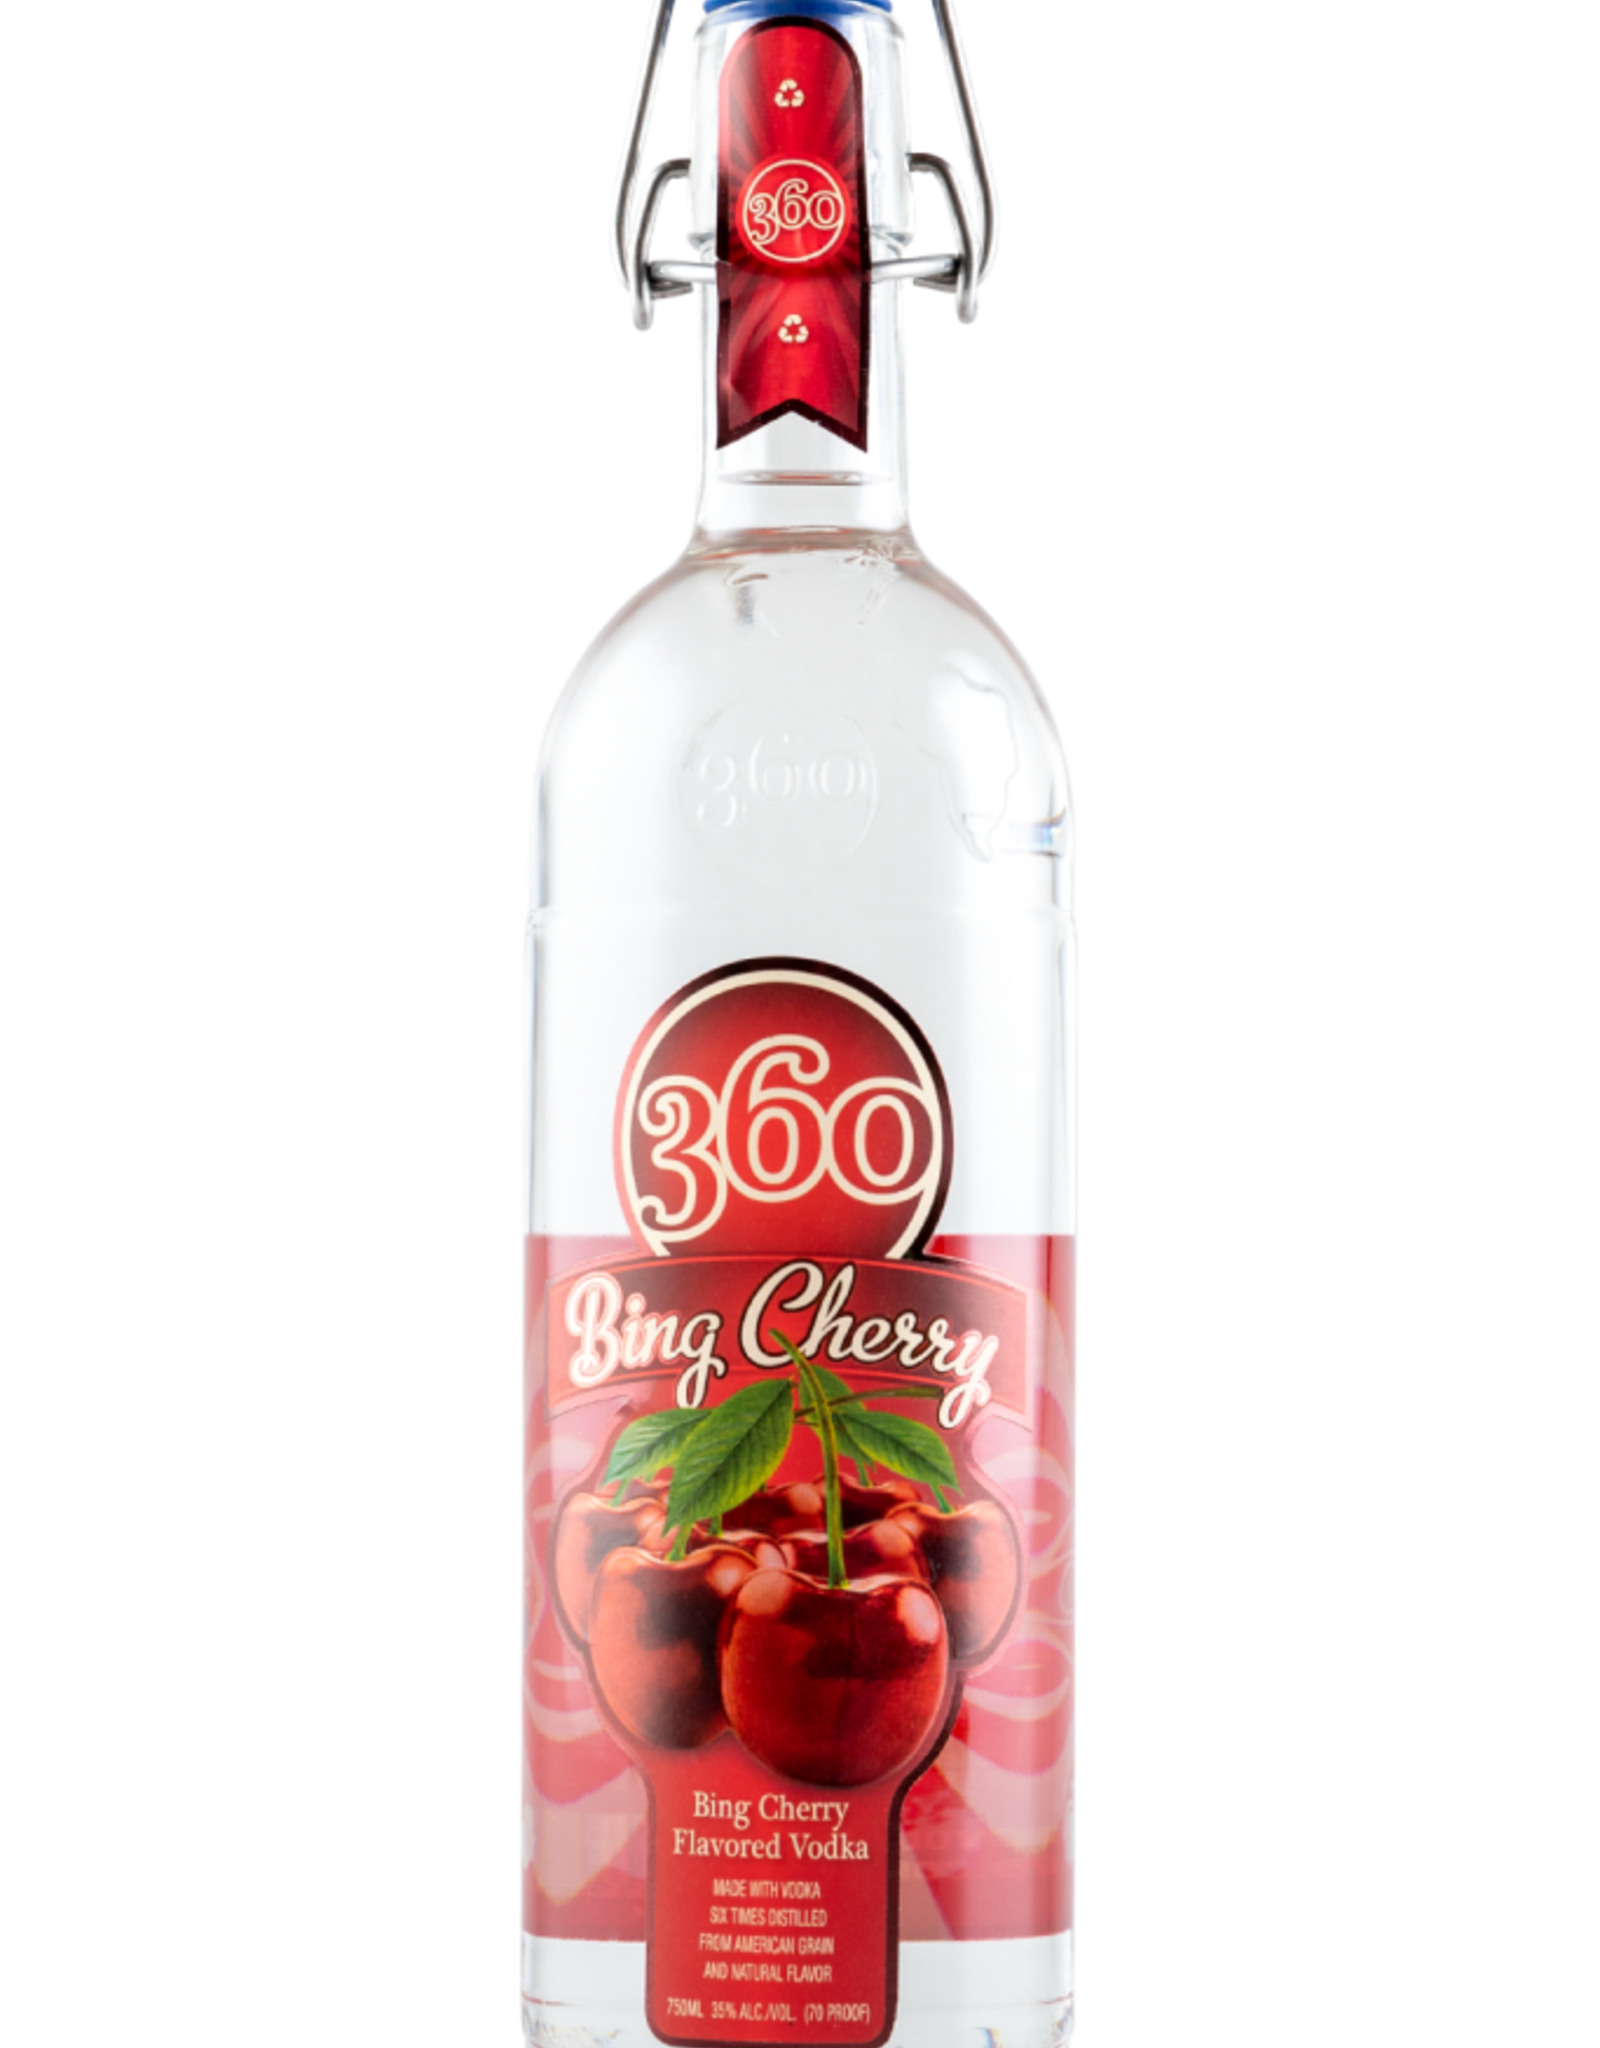 360 Bing Cherry Vodka 750ML